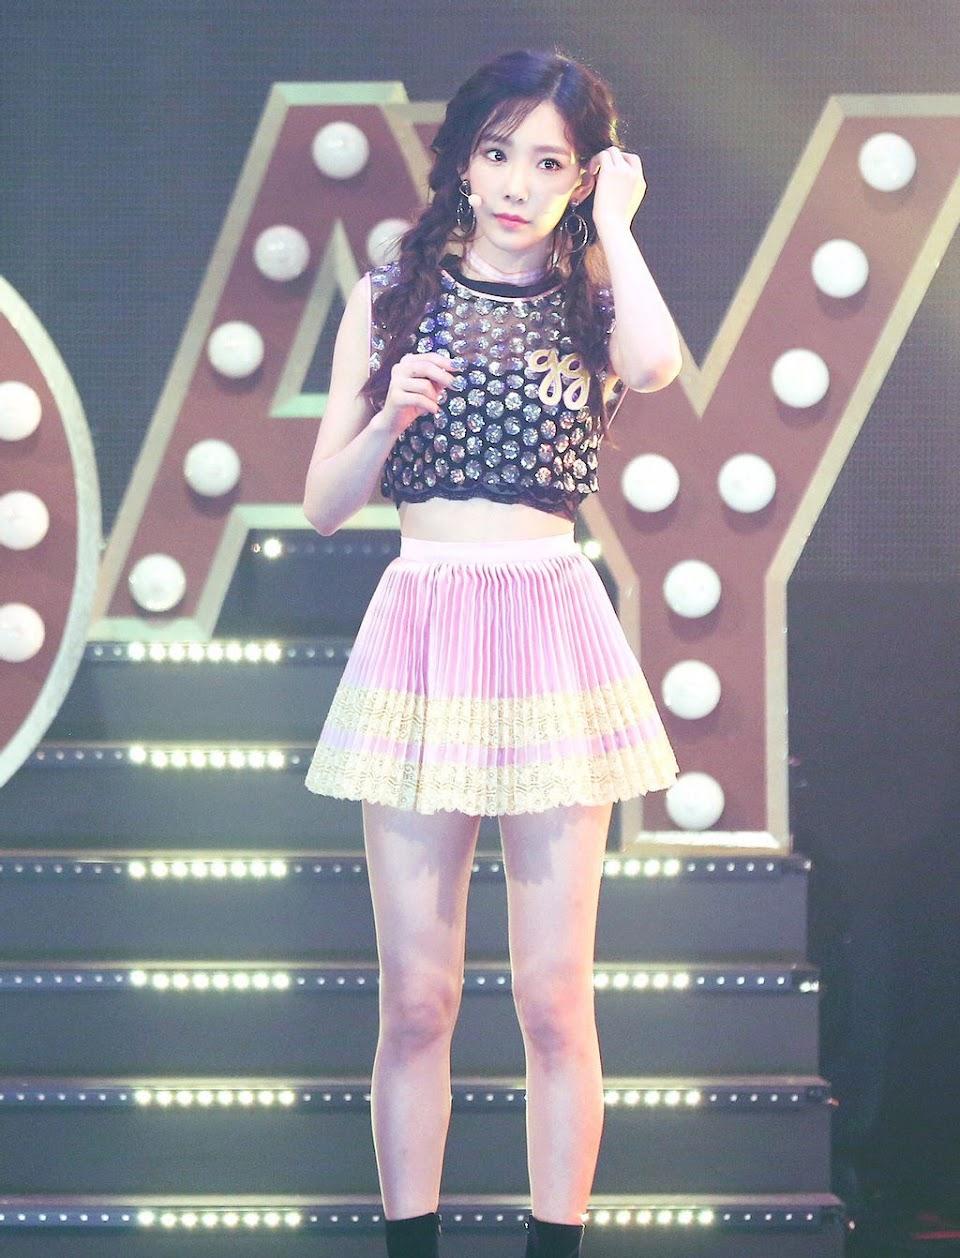 taeyeon_holiday_by_nanas99_dc1bo23-fullview